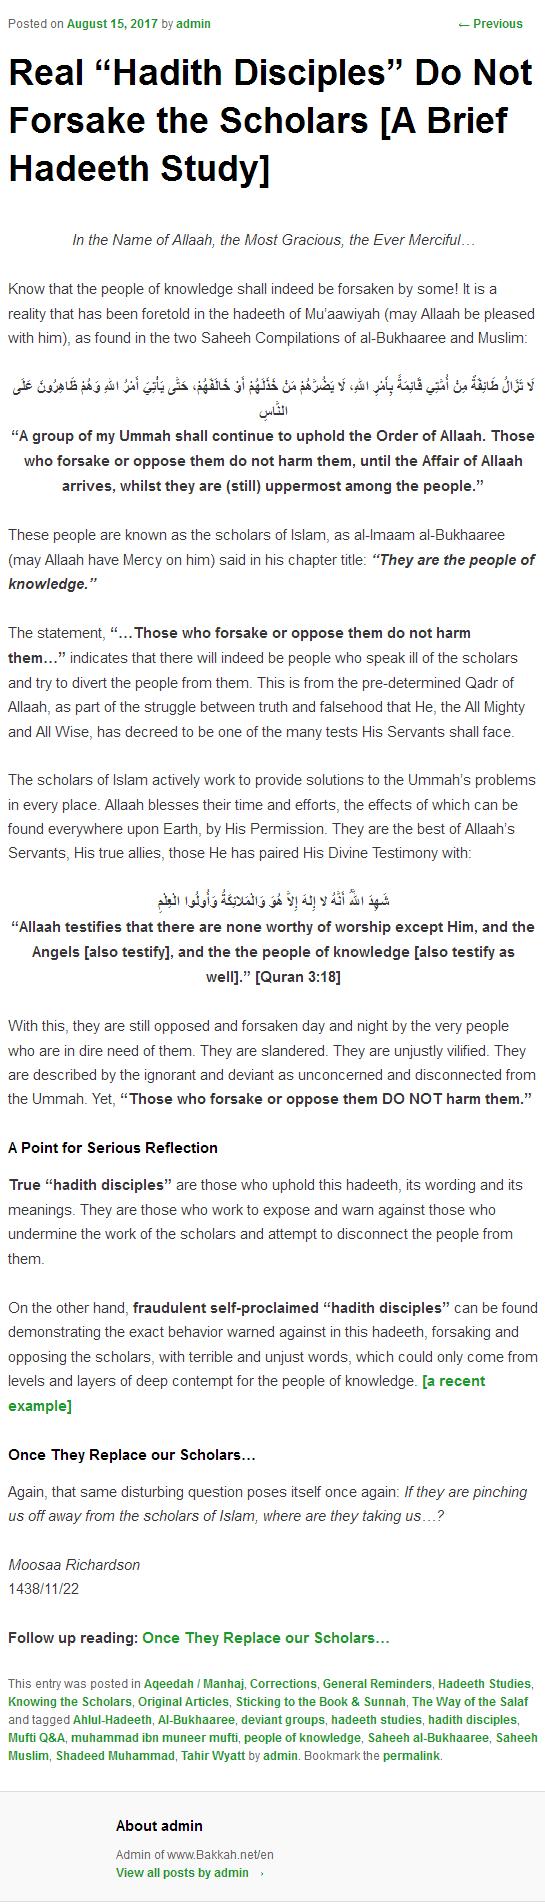 Mufti' Muhammad Munir's Accusation of Shirk Akbar Against